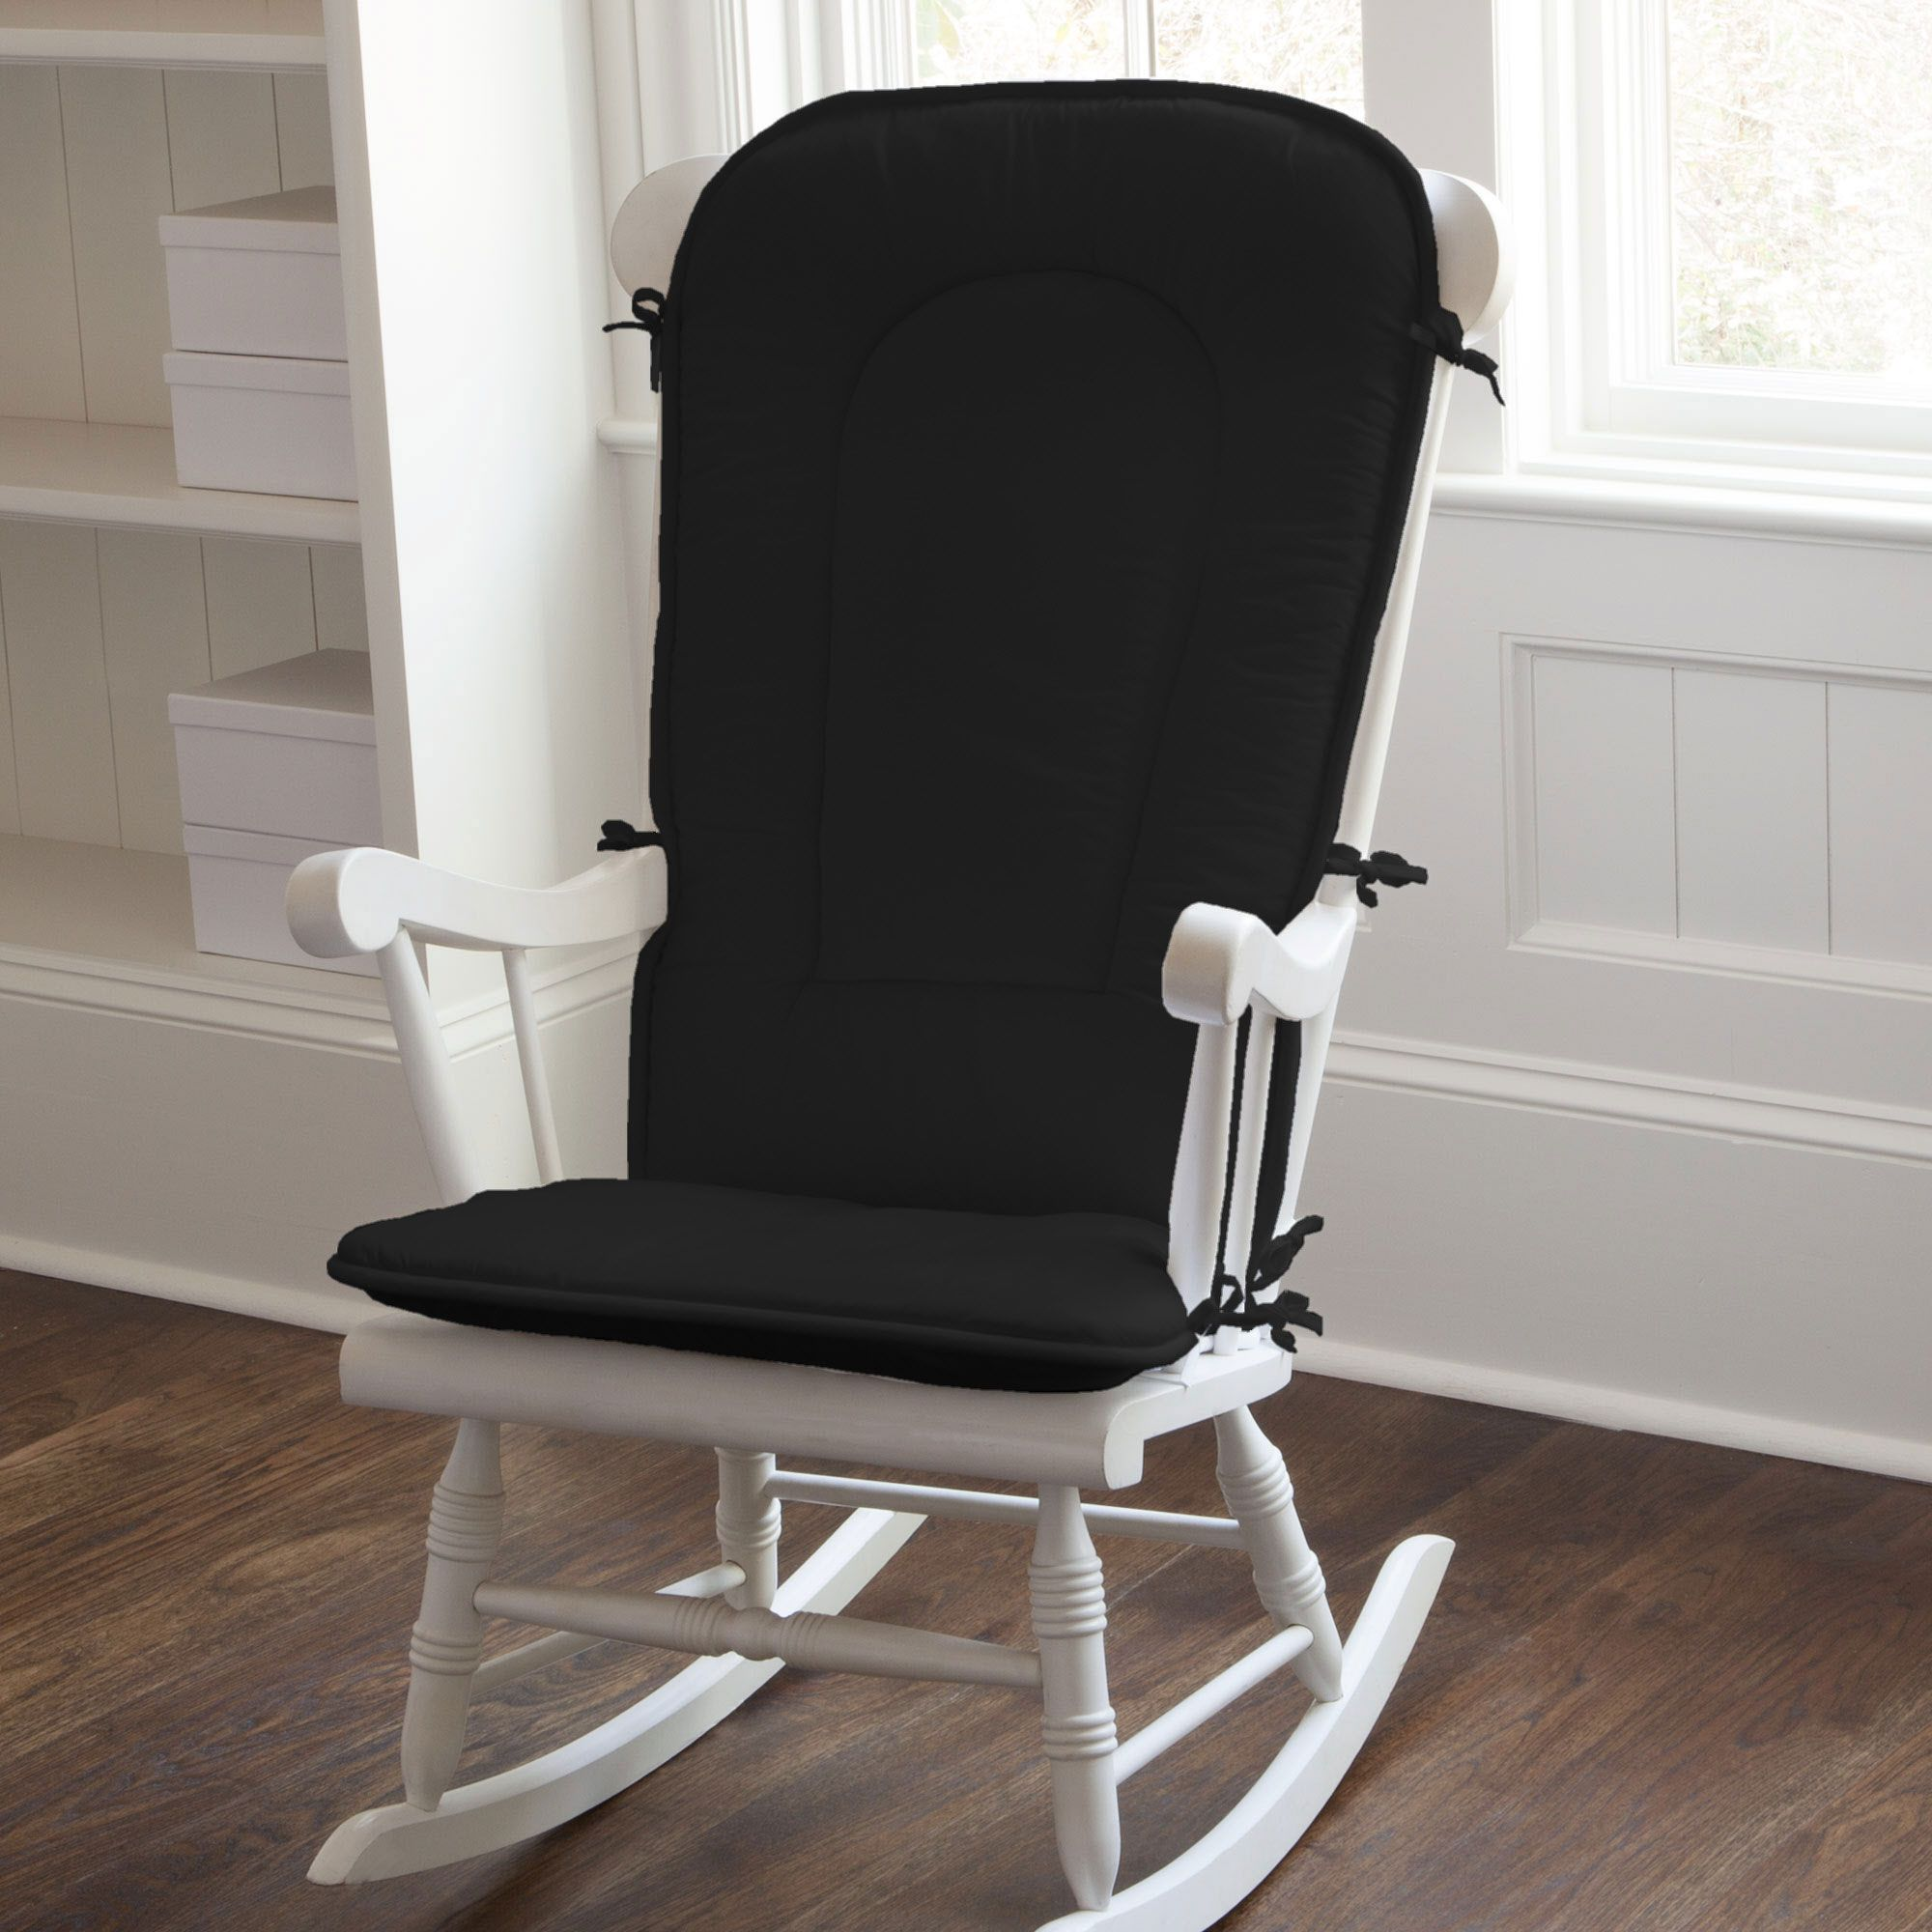 Solid Black Rocking Chair Pad